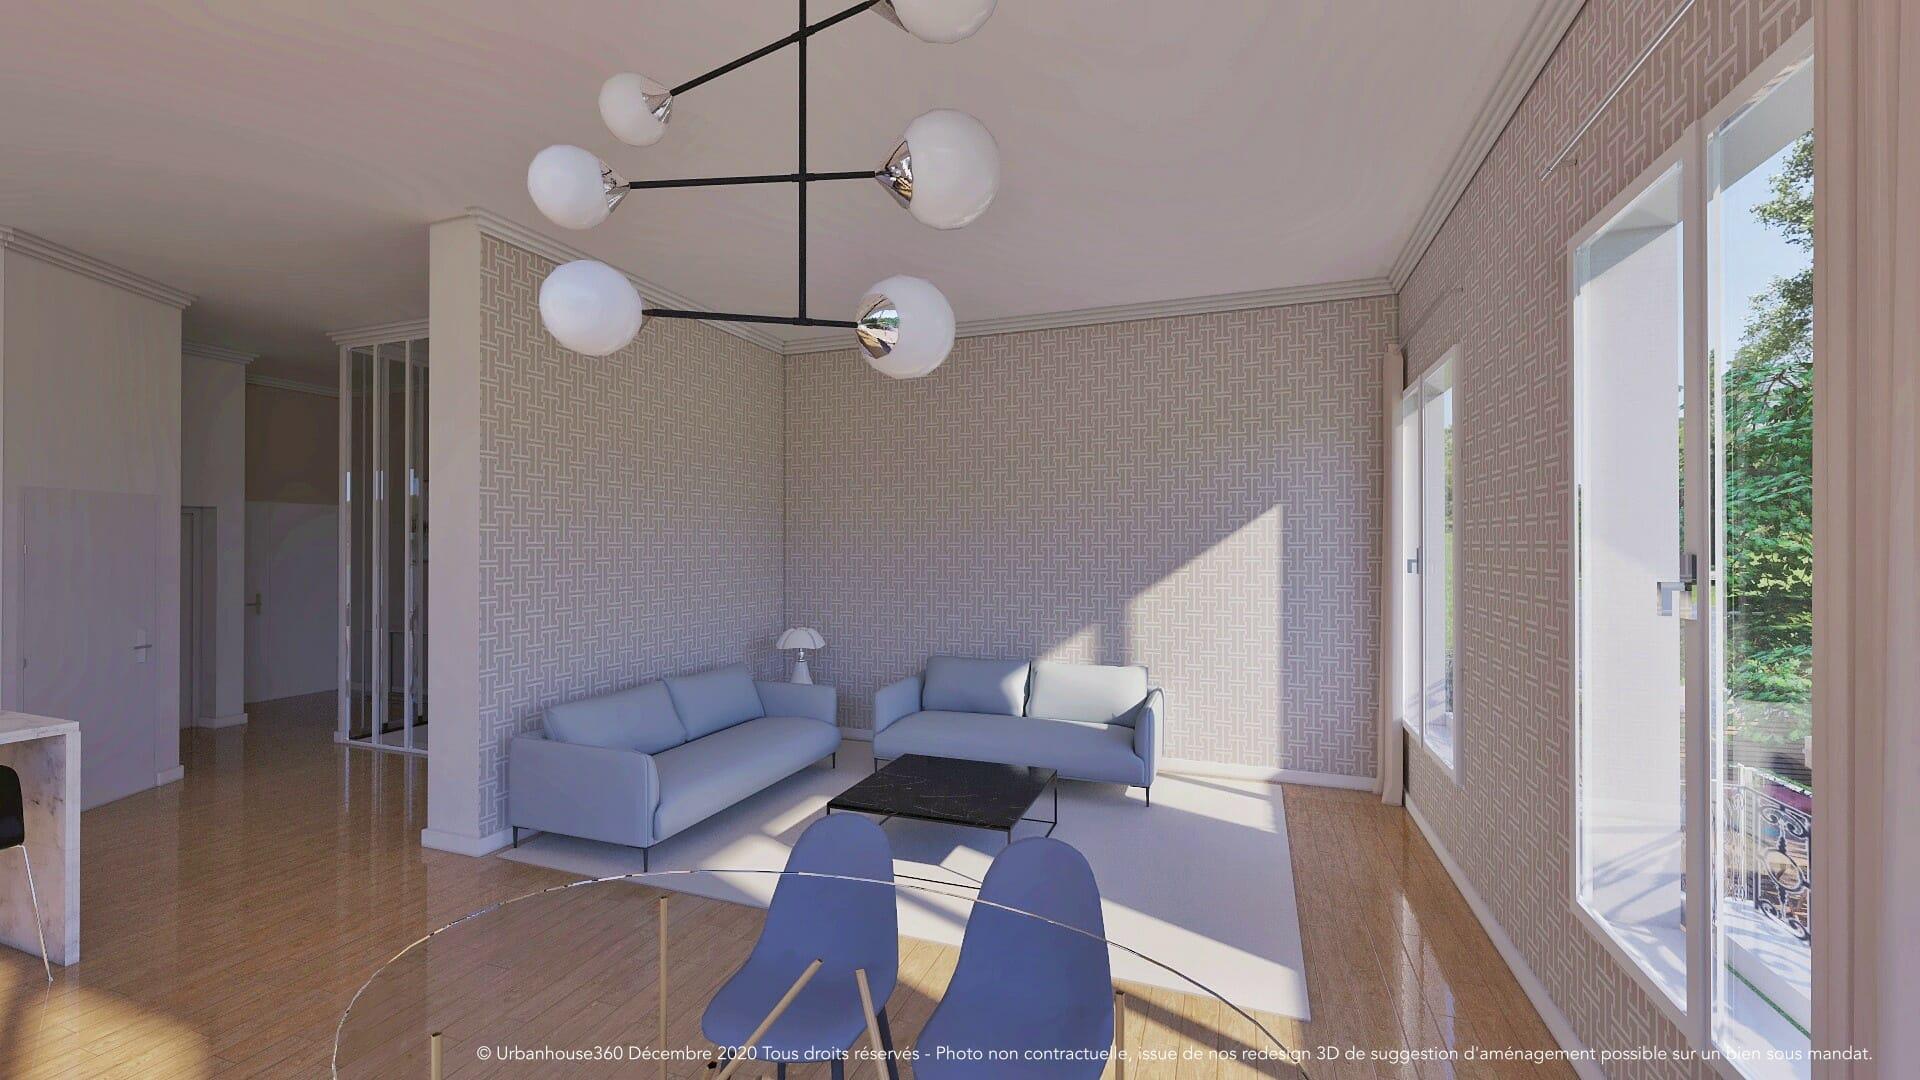 UrbanHouse360_LaCostaPavada_2lots